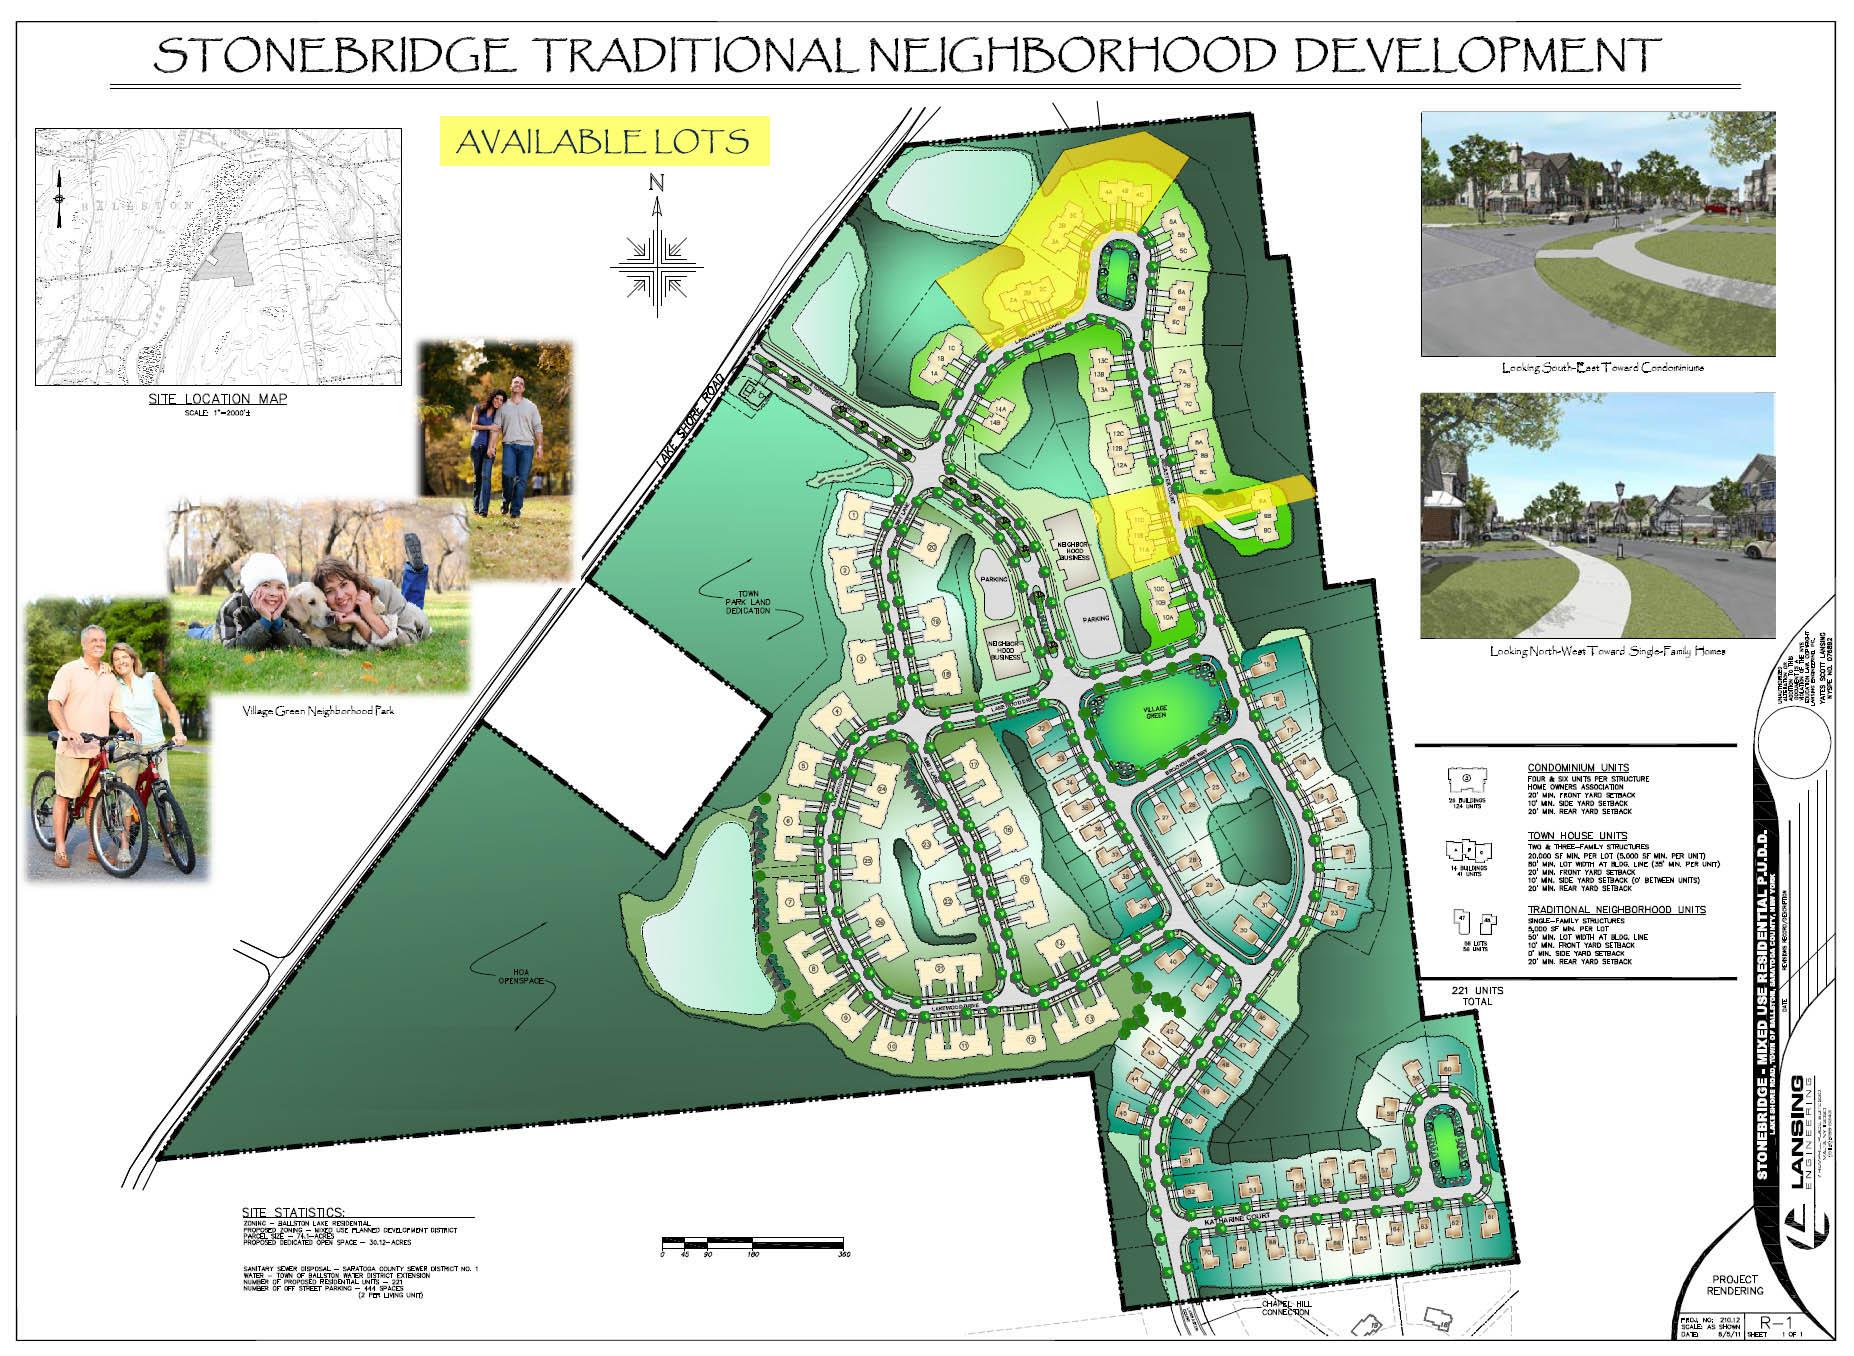 Stonebridge Available Lots Map